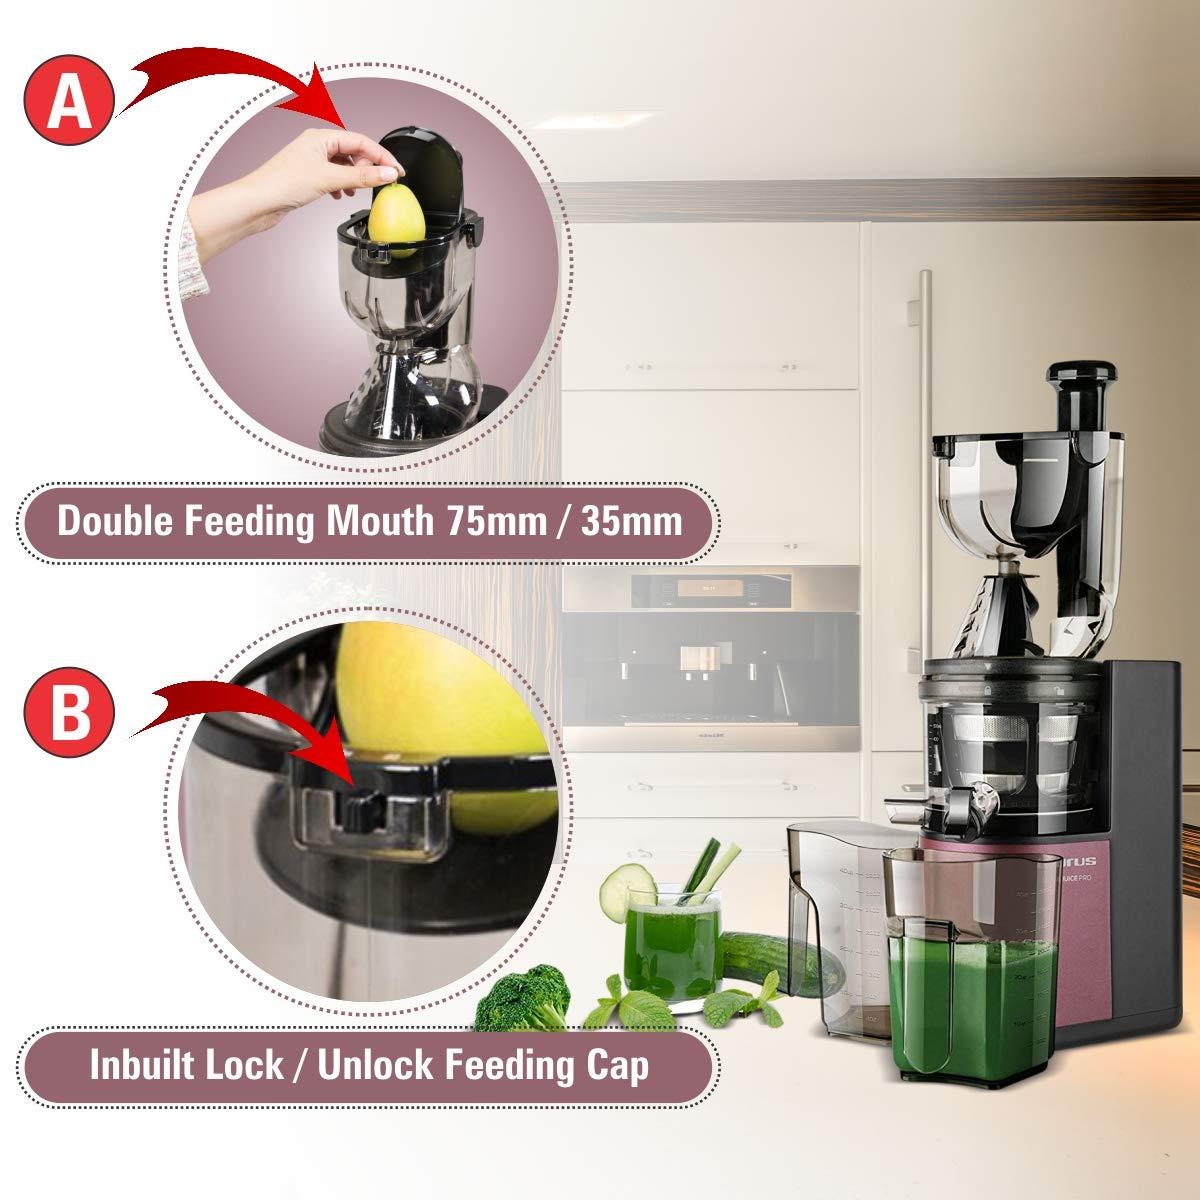 Taurus Liquajuice Pro-Licuadora extraccion en Frio (200 W, 43 RPM, Sistema antigoteo), Color Rosa: Amazon.es: Hogar